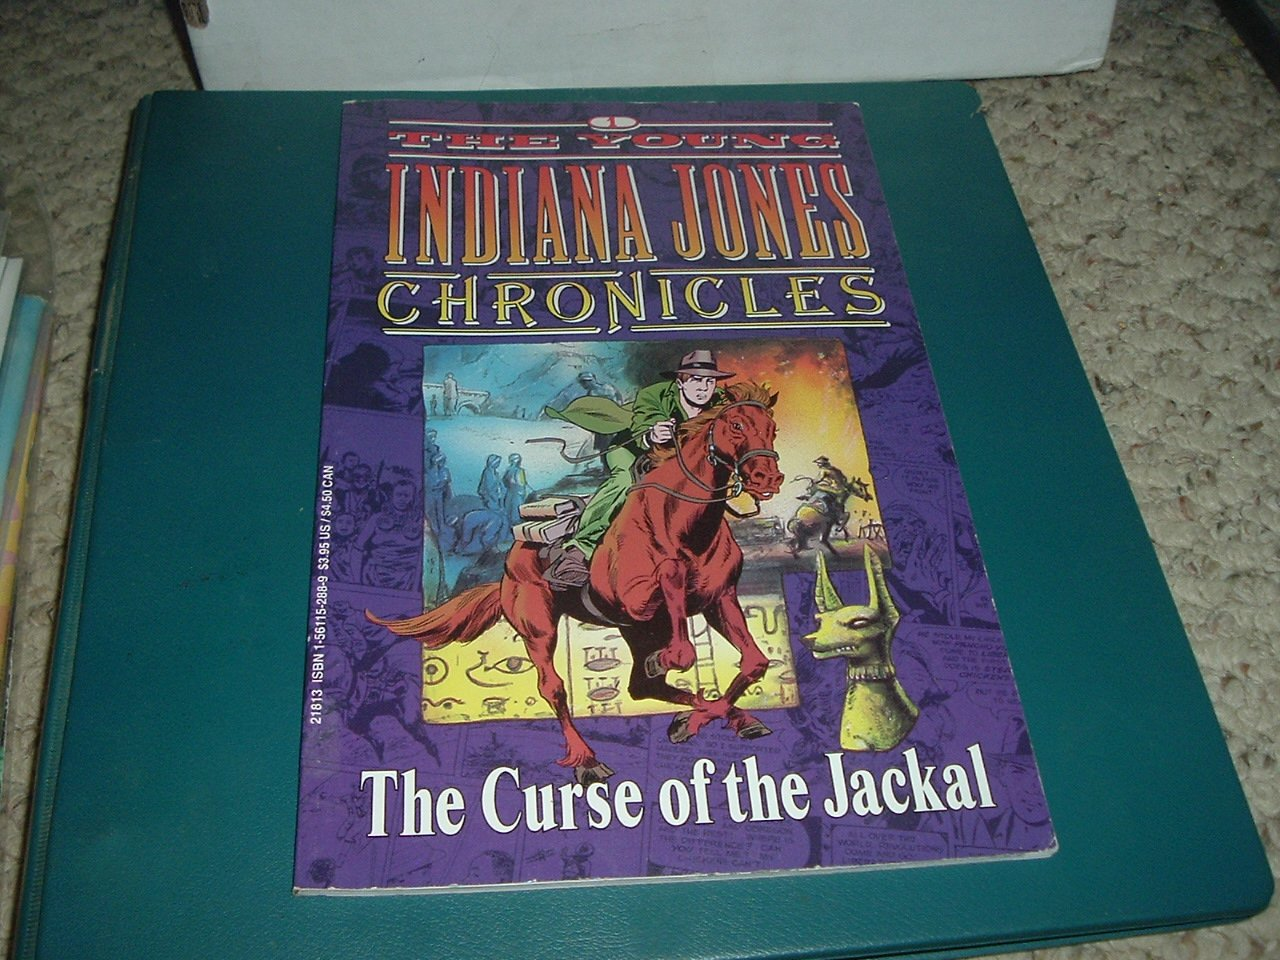 Young Indiana Jones Chronicles Volume 1: Curse of the Jackal GN (Dark Horse bookshelf graphic novel)